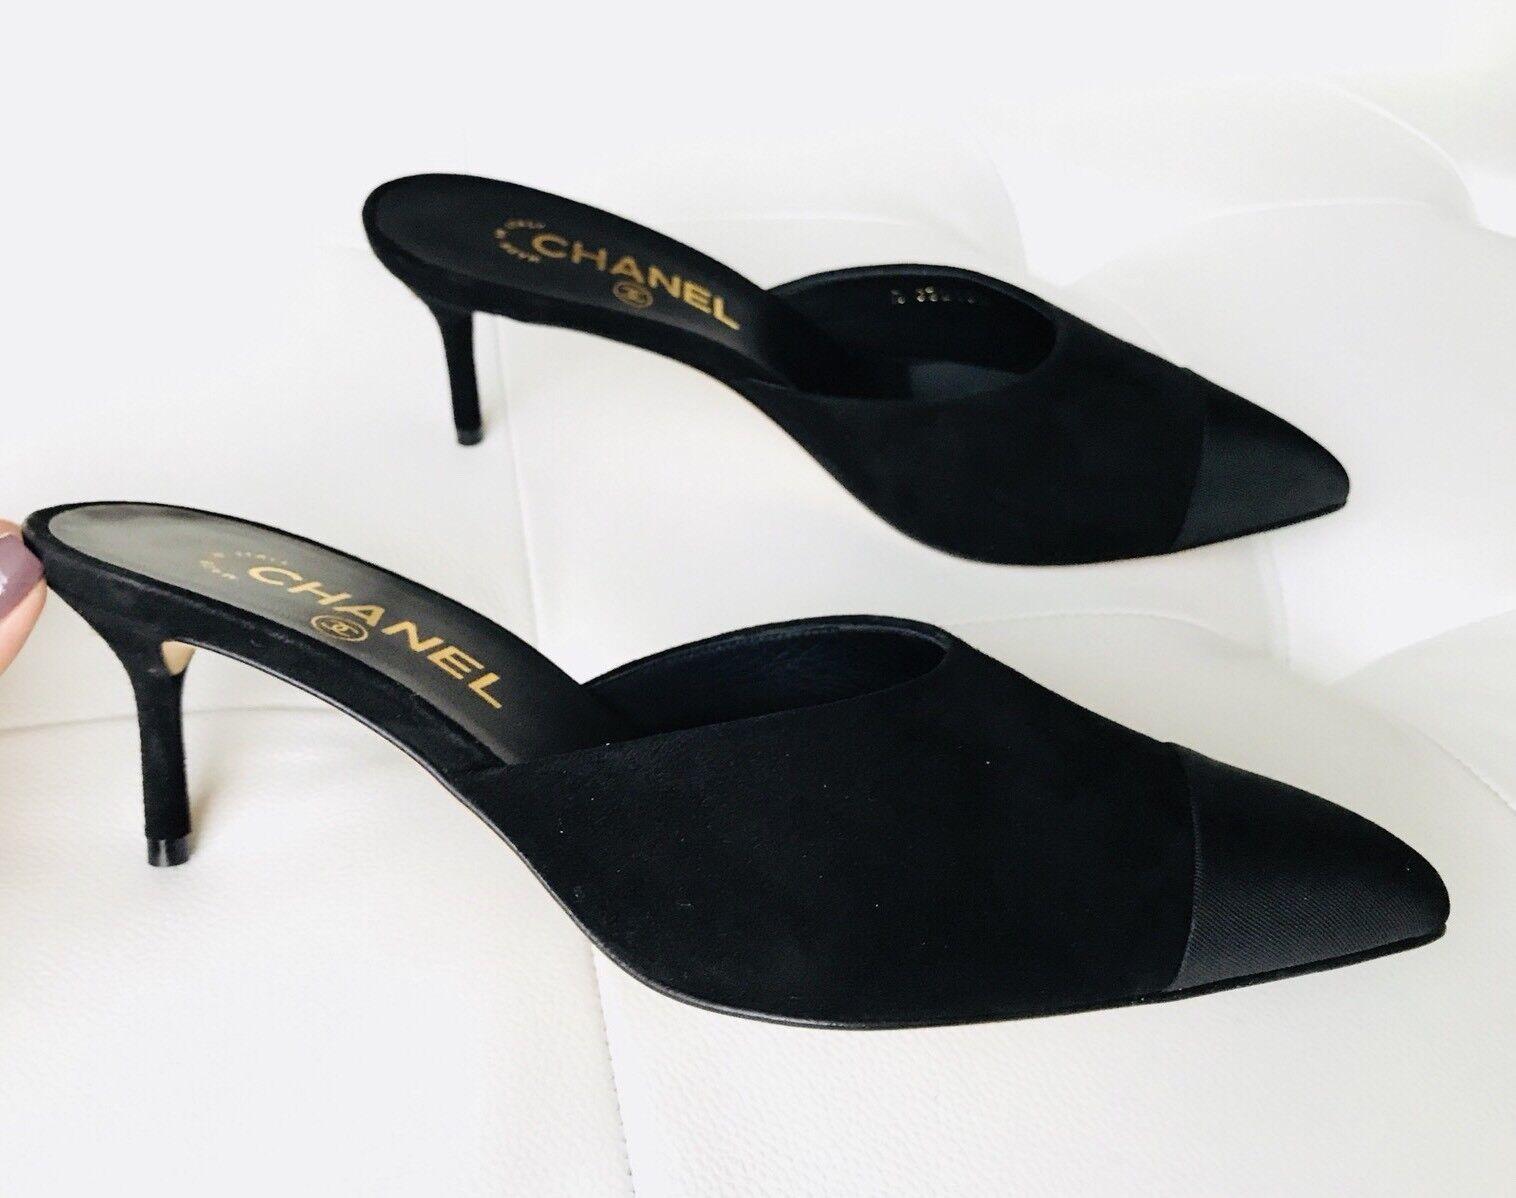 800 17P CHANAEL nero SUEDE MULES SLIDES scarpe CC LOGO HEELS Dimensione 35.5